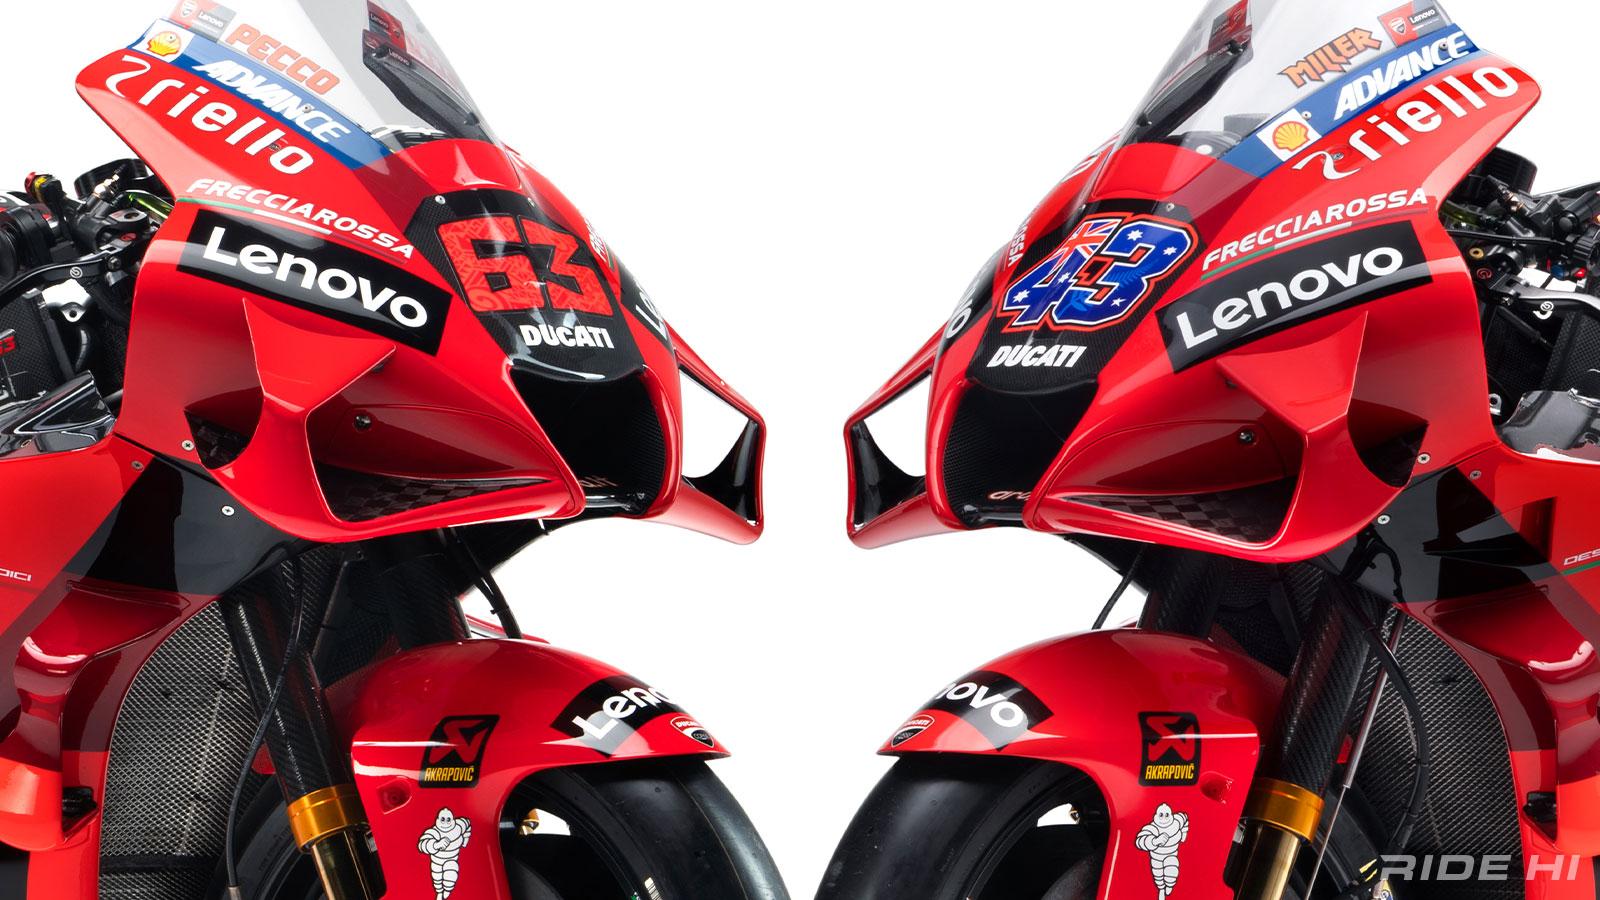 Bi mat dang sau nhung canh gio winglet tren MotoGP - 6